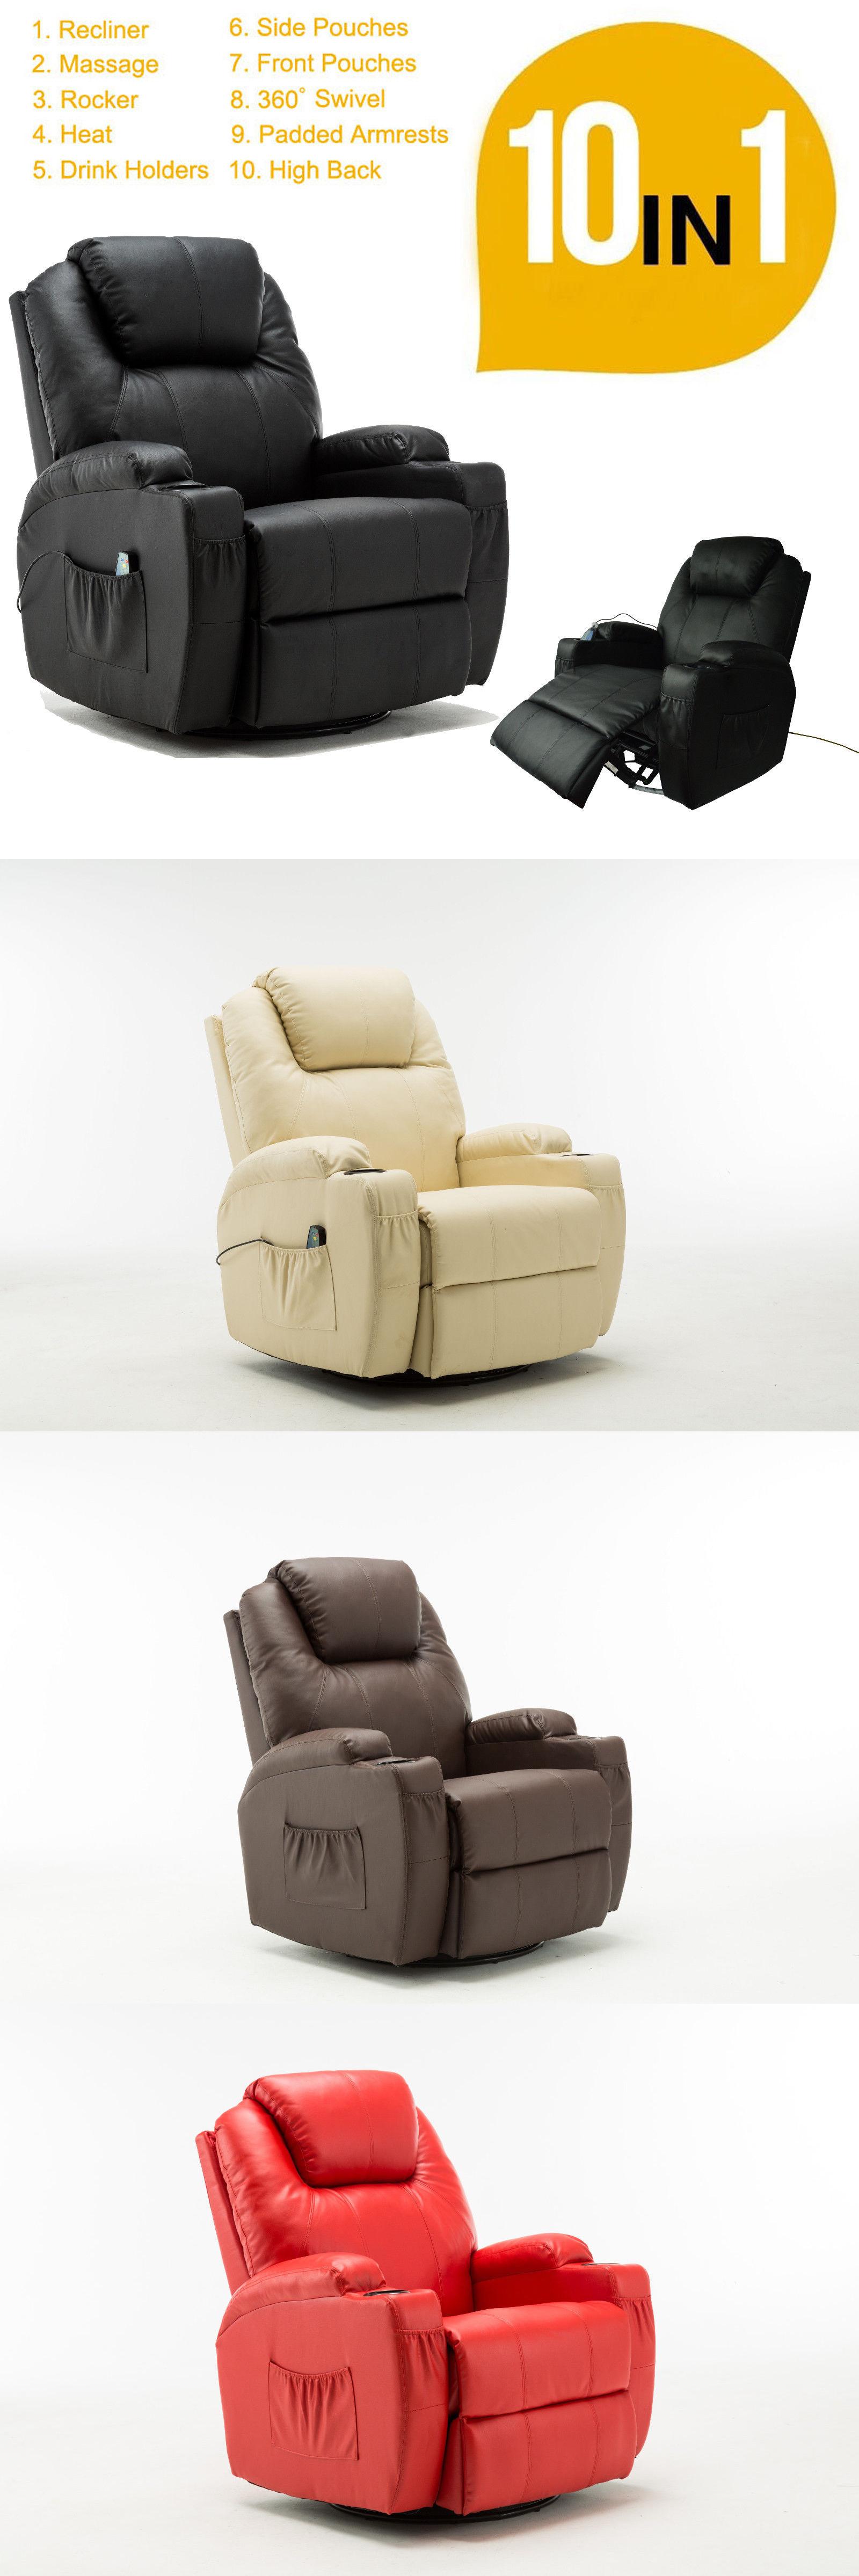 Electric Massage Chairs Massage Recliner Sofa Chair Vibration